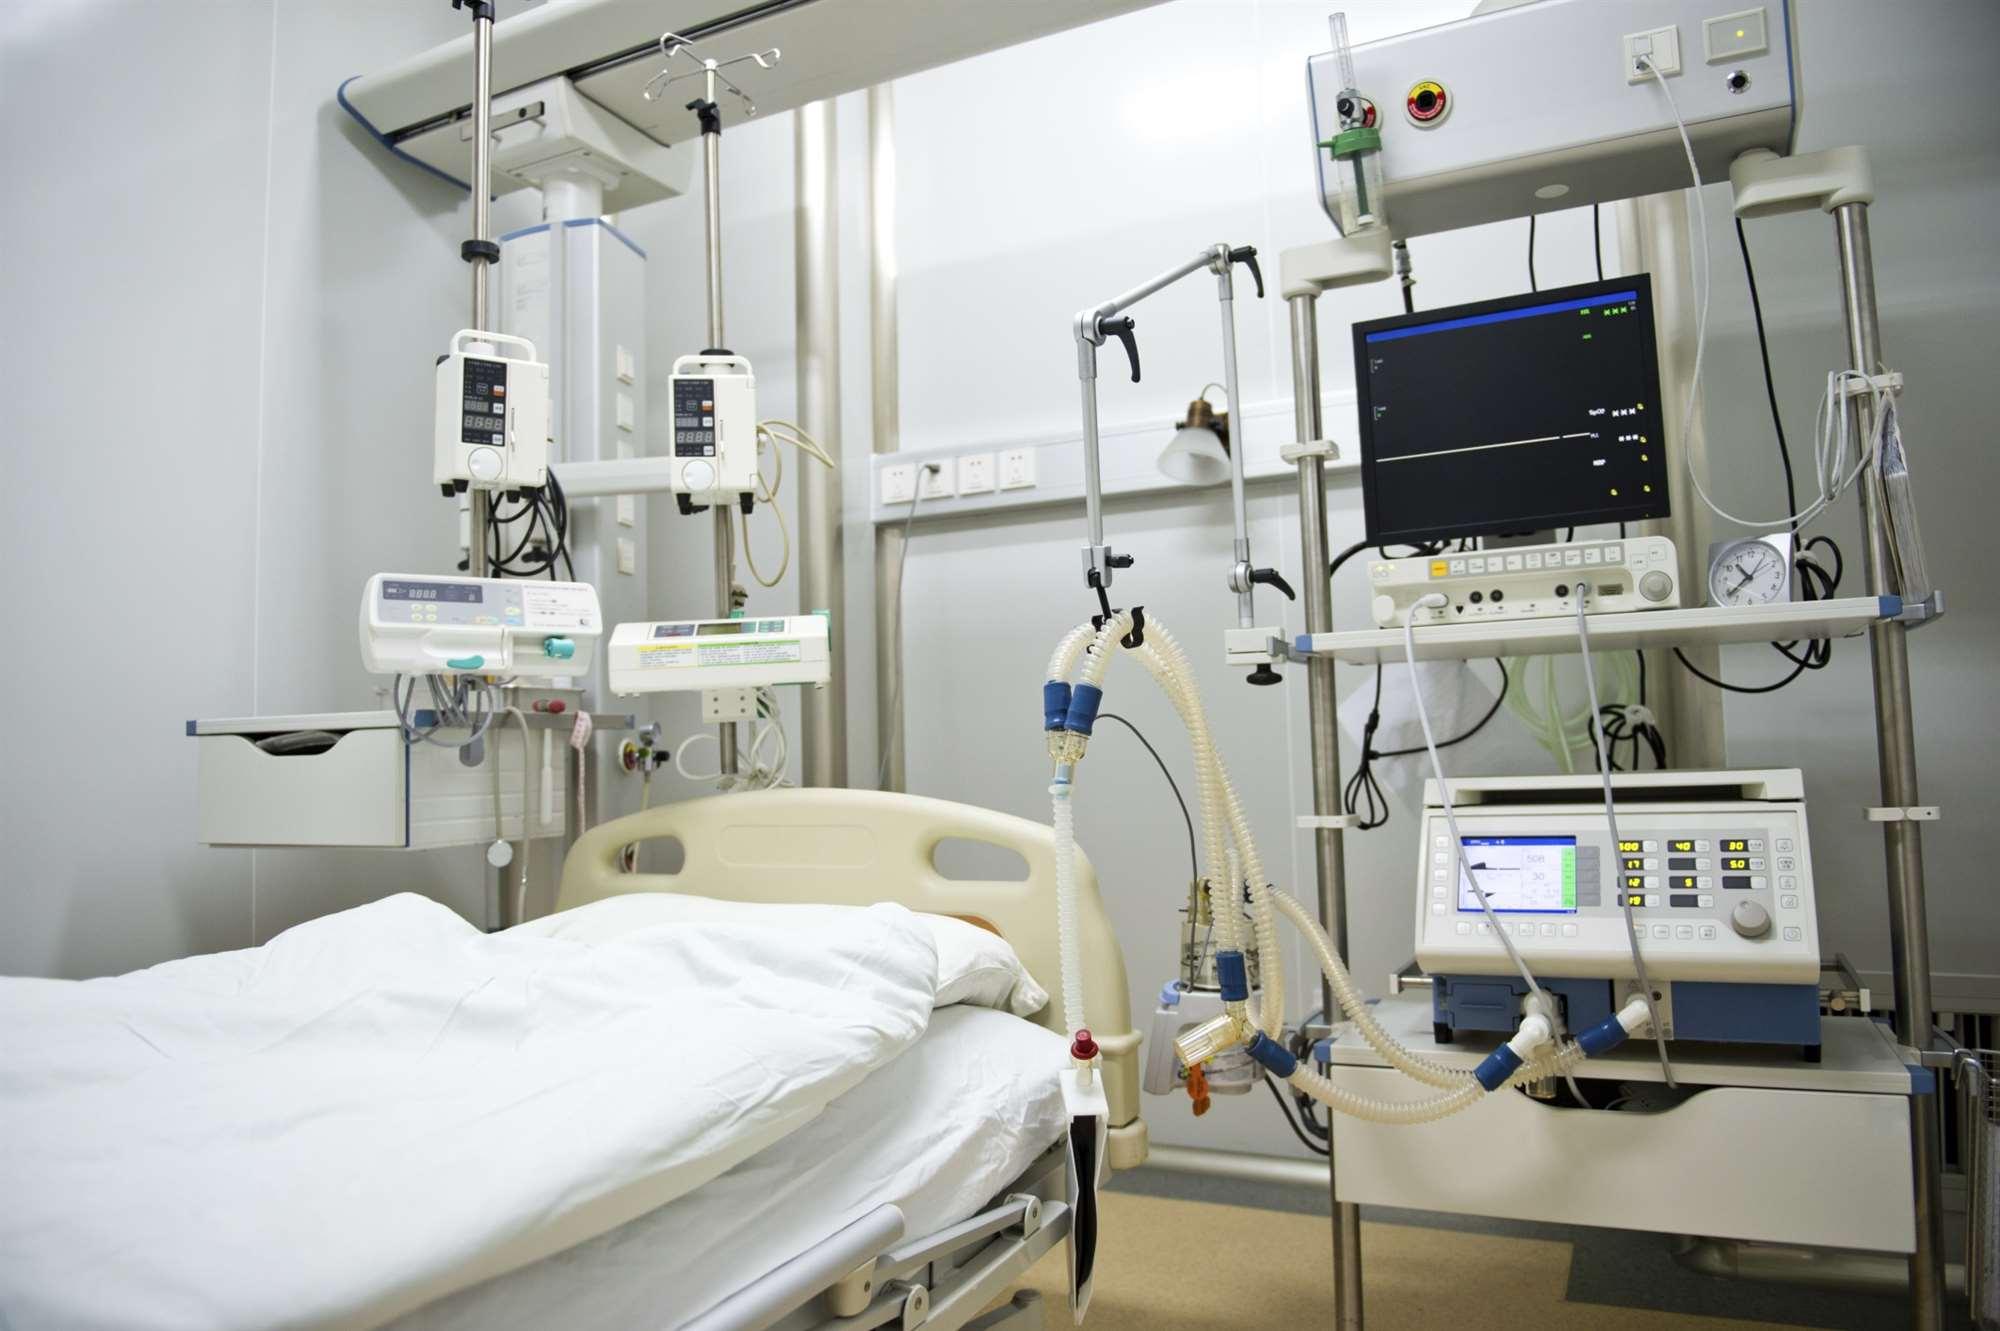 hospital machine